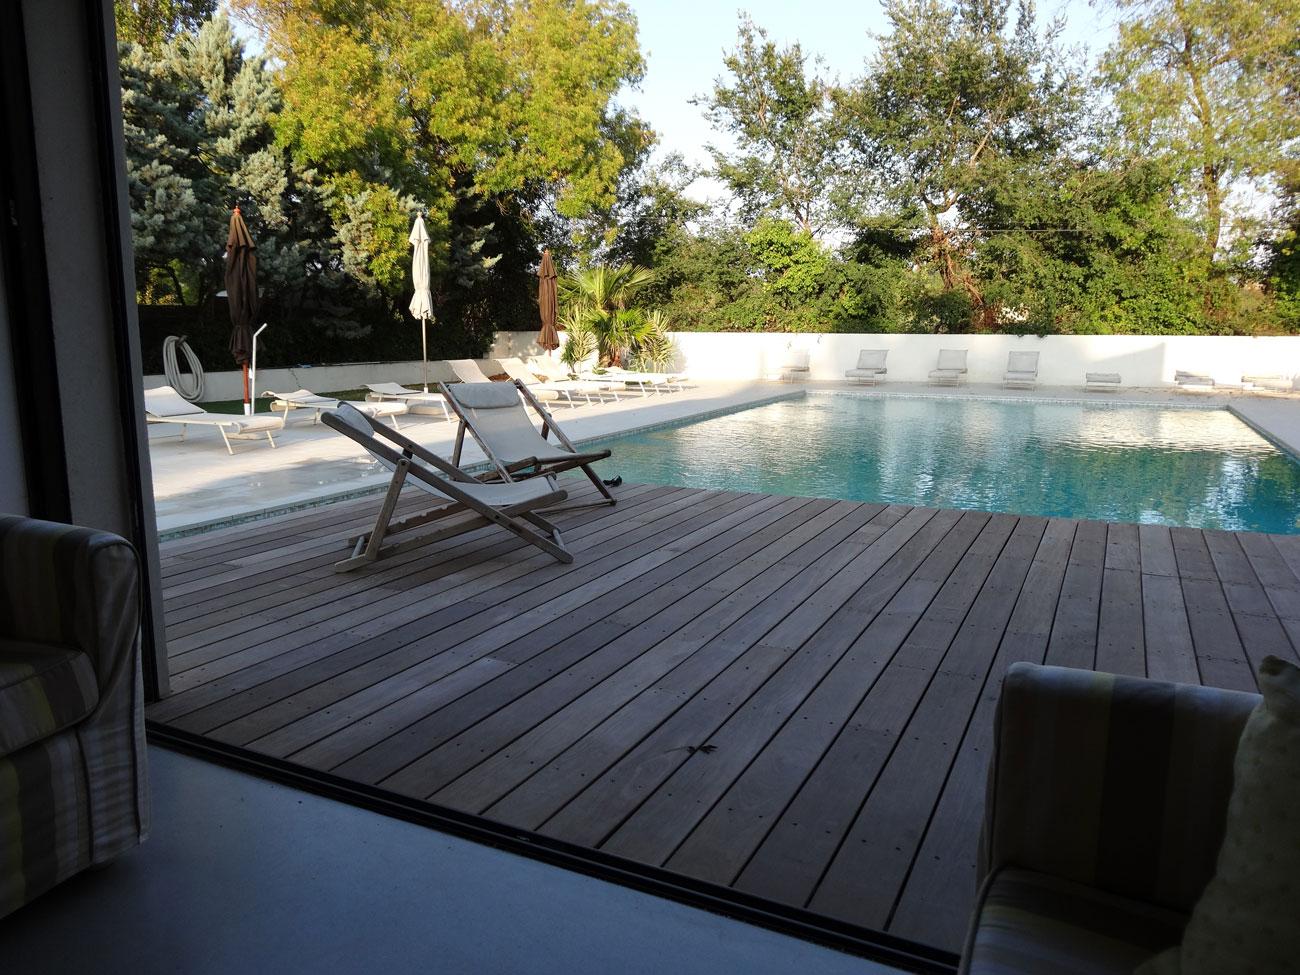 le blavet terrasse piscine bar le blavet location pour tournages et shootings. Black Bedroom Furniture Sets. Home Design Ideas